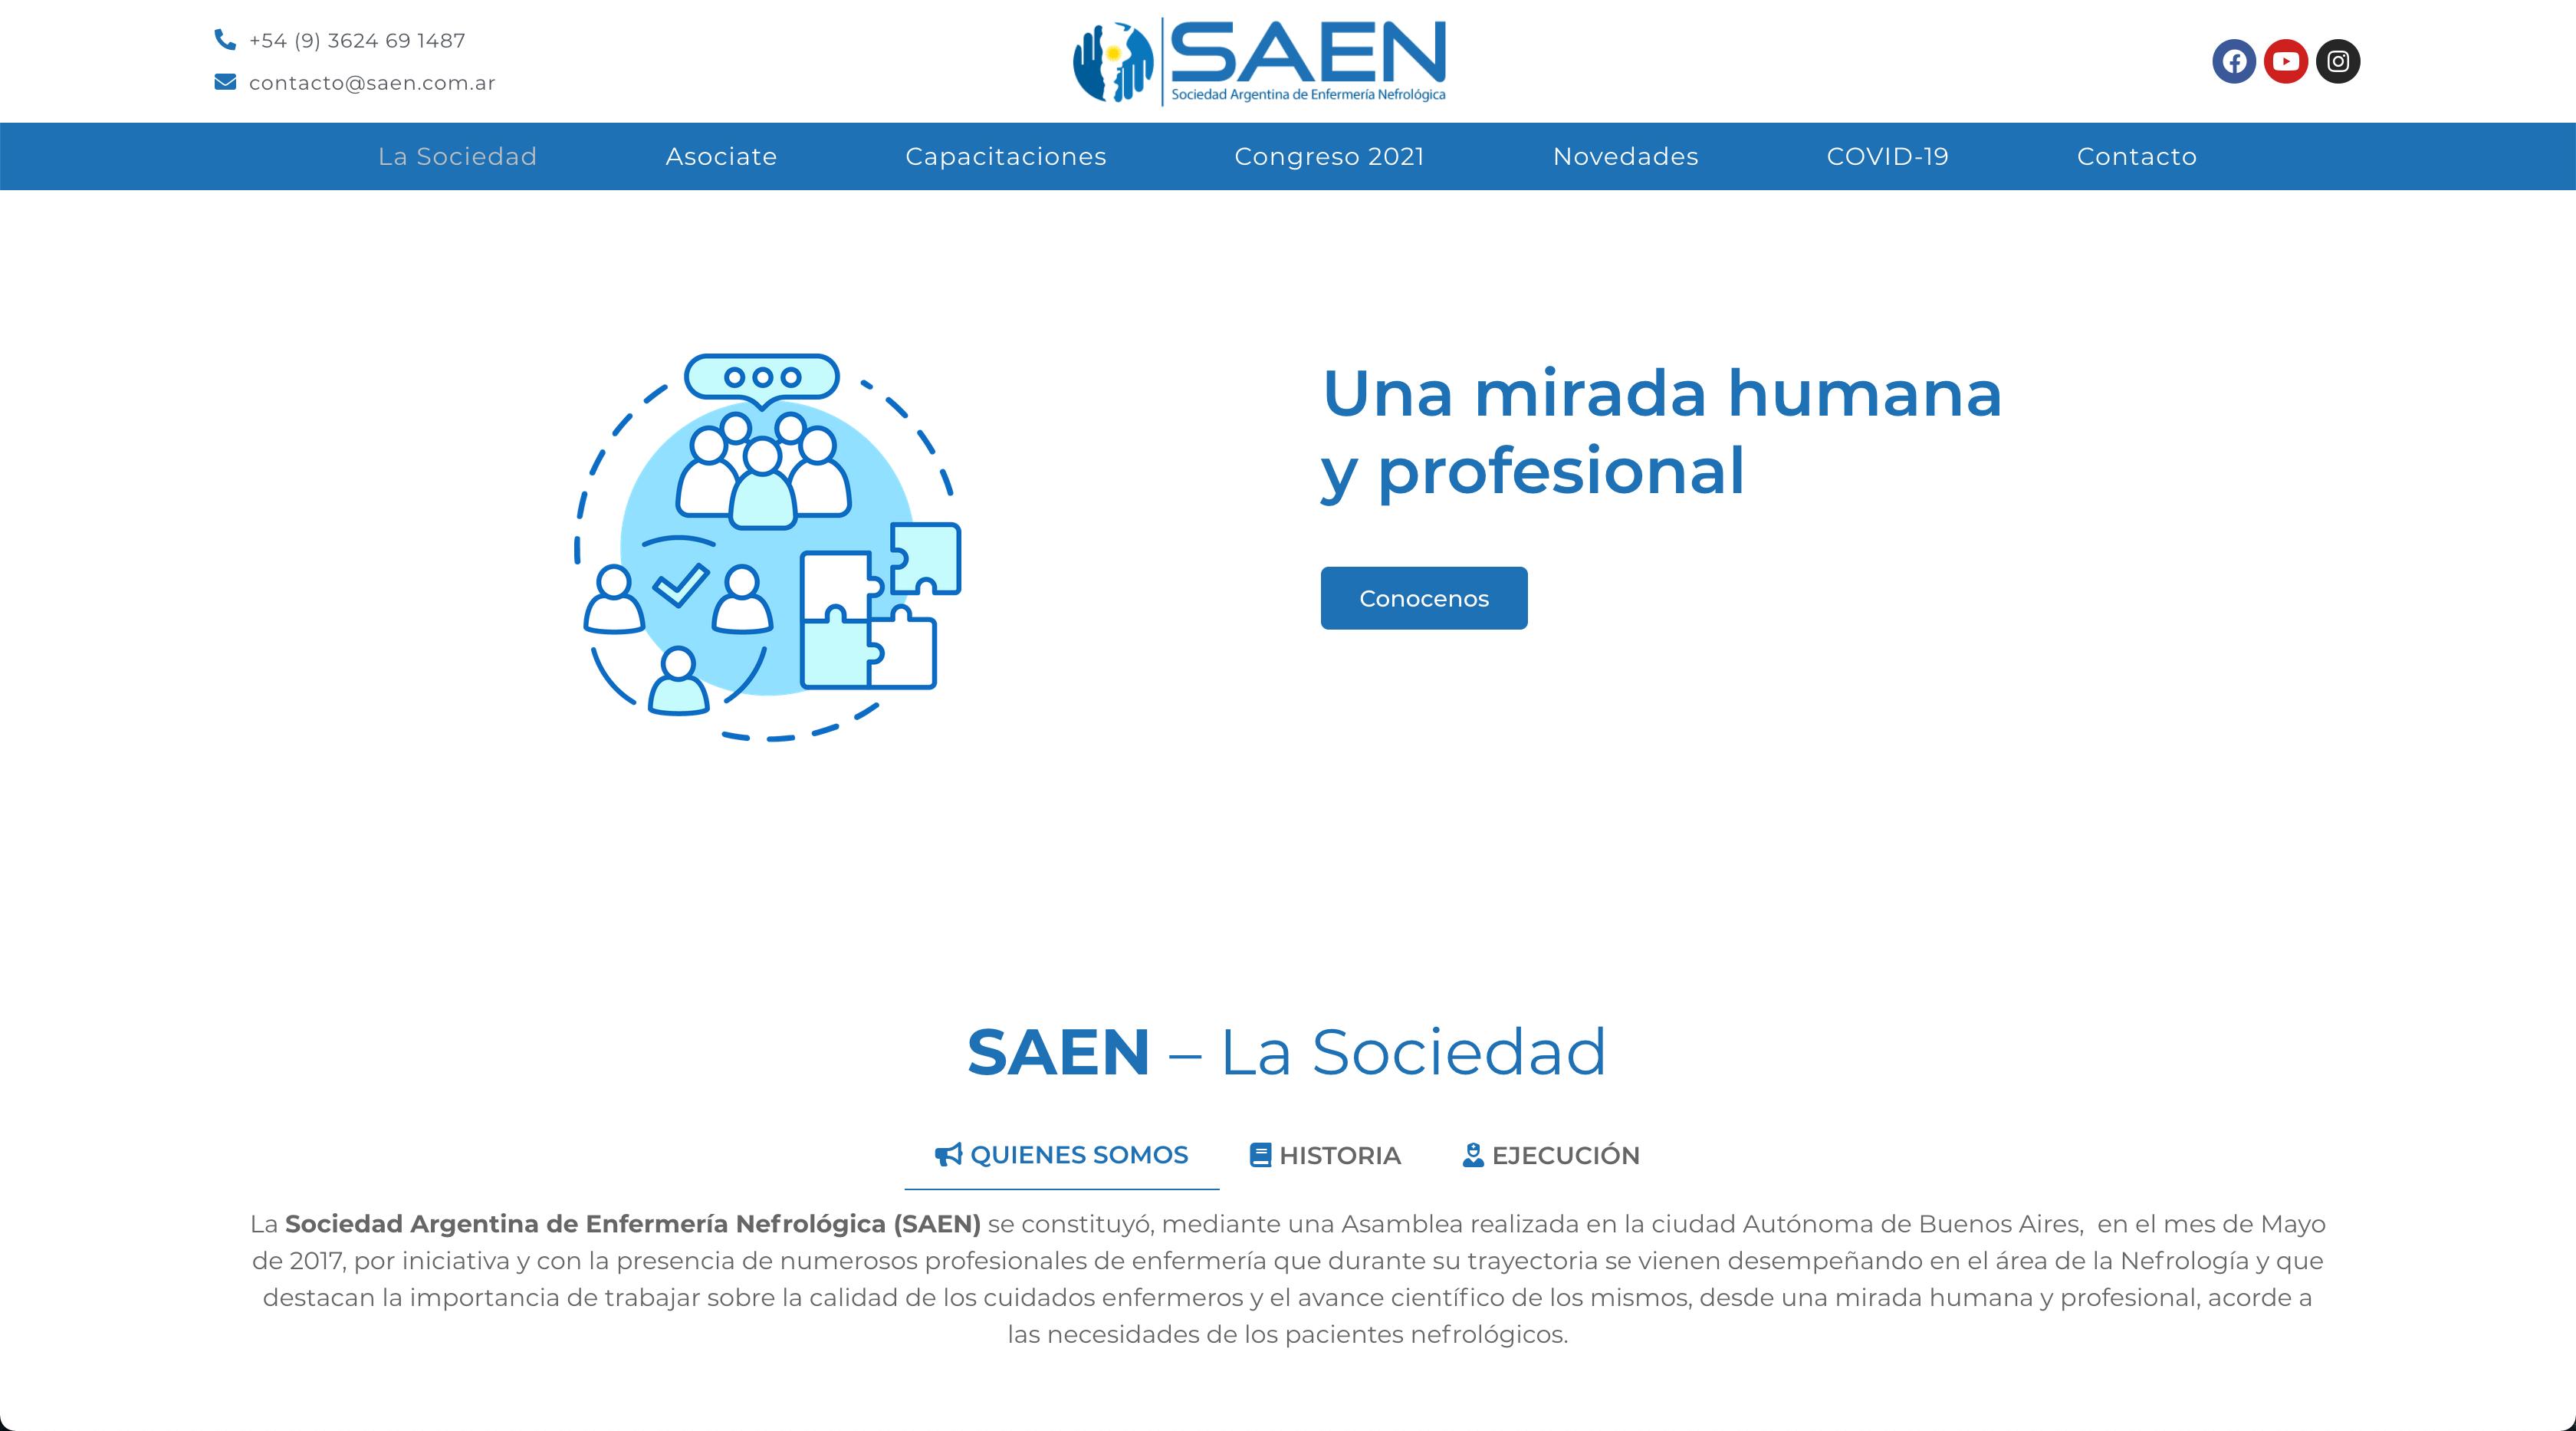 saen-sociedad-argentina-de-enfermeria-nefrologica-online-lab-web-development-web-design-11